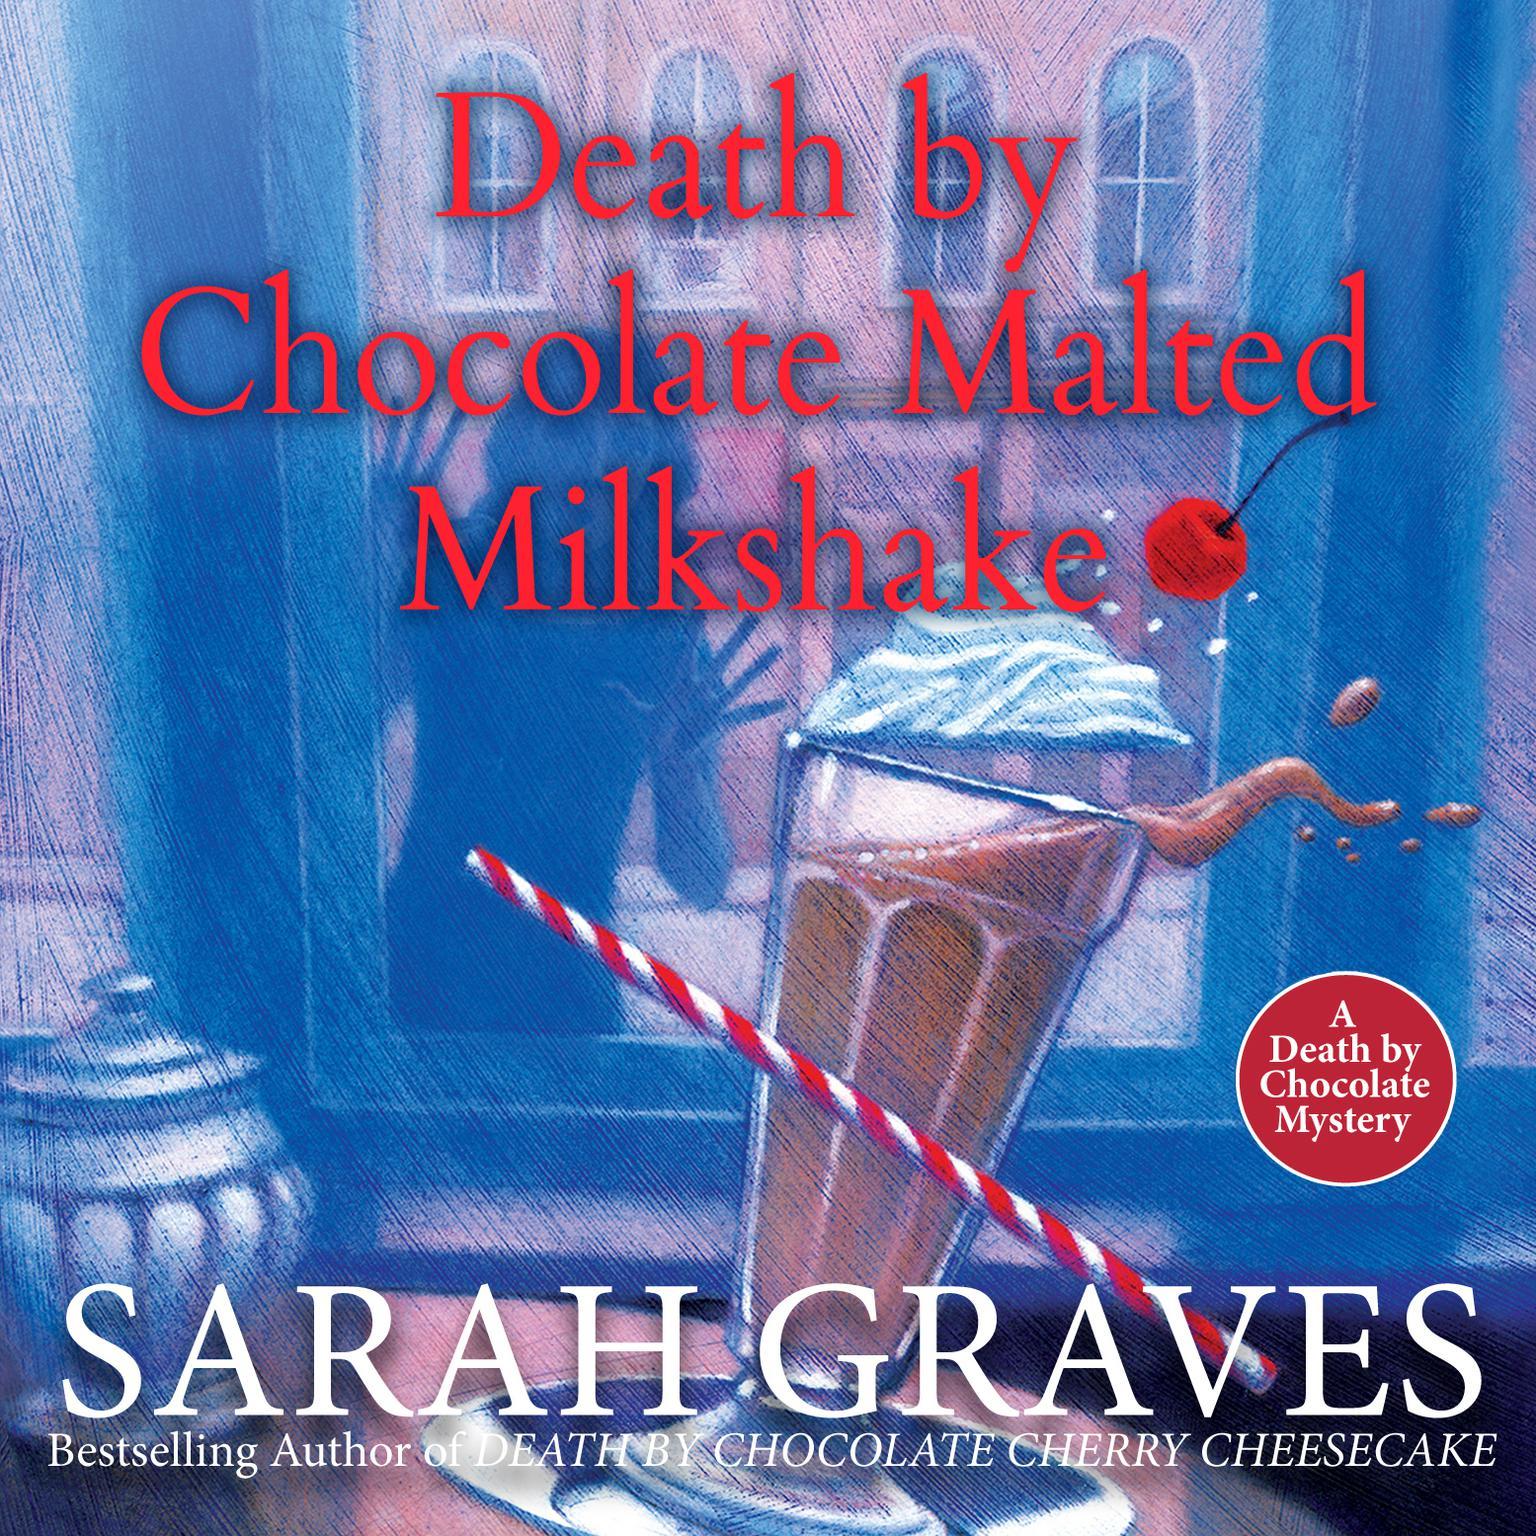 Printable Death by Chocolate Malted Milkshake Audiobook Cover Art